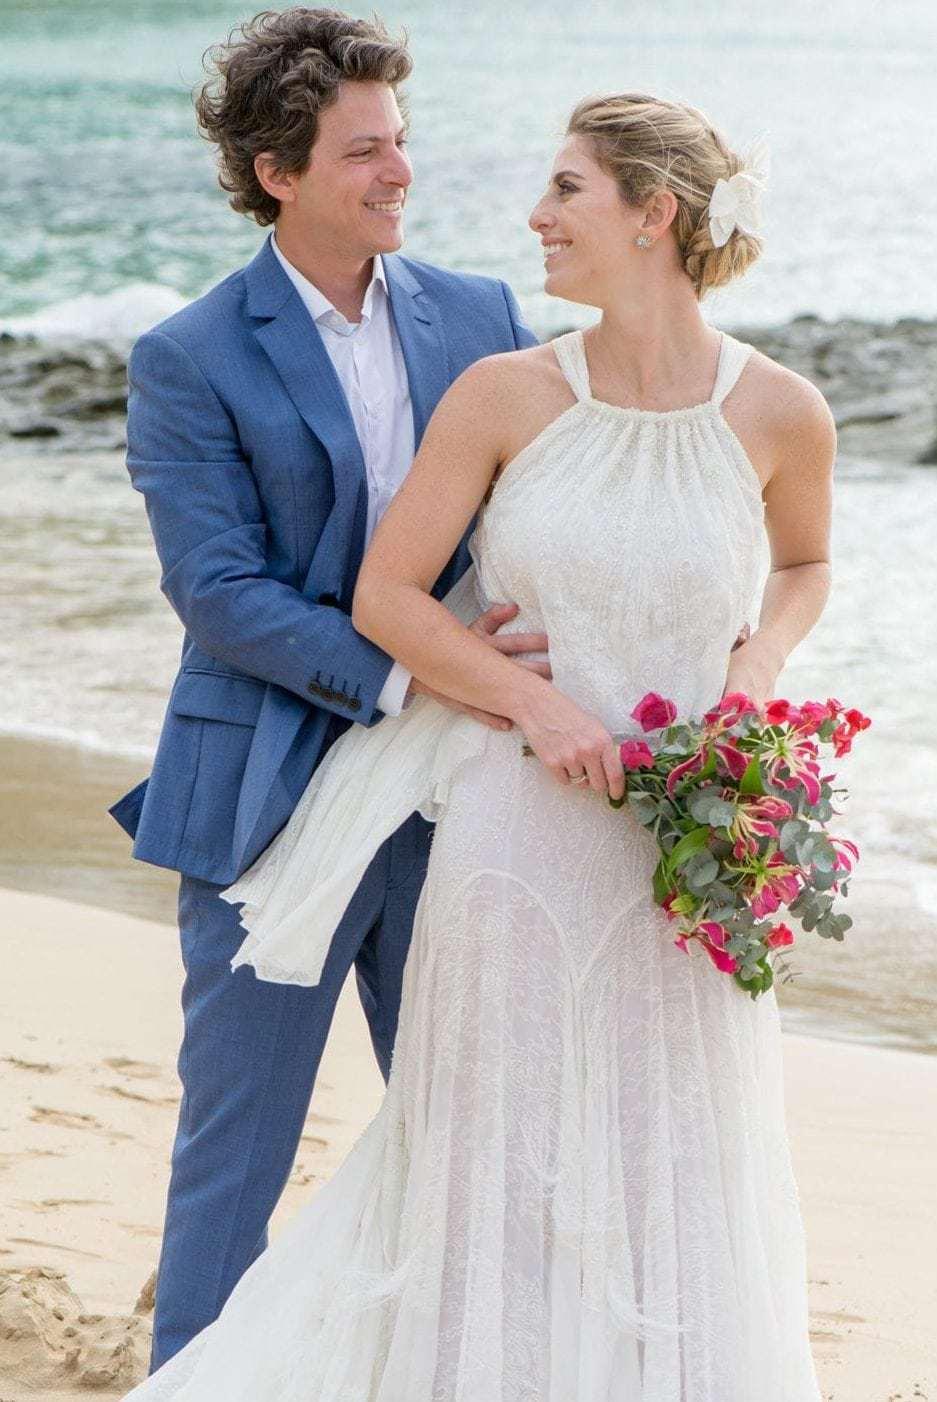 casamento-roberta-e-bernardo-caseme-foto-marina-fava-31-e1533757130751